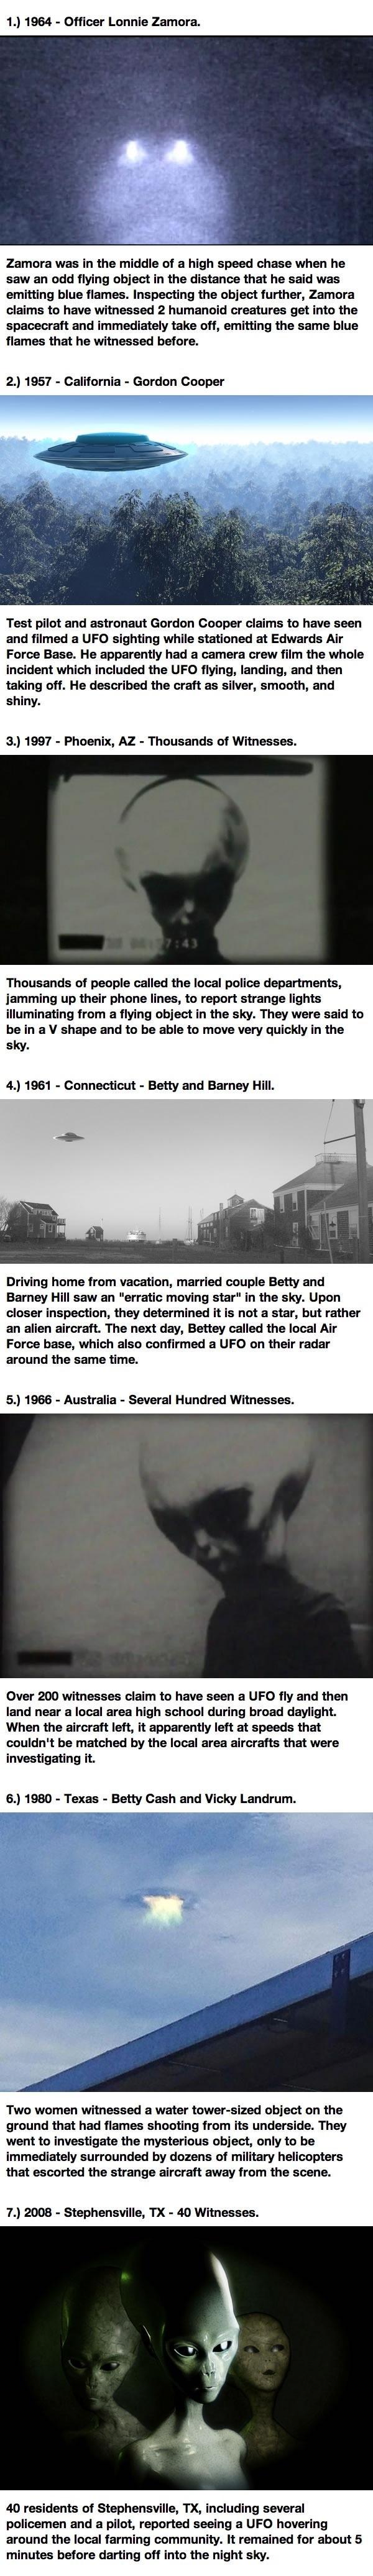 Alien encounter stories